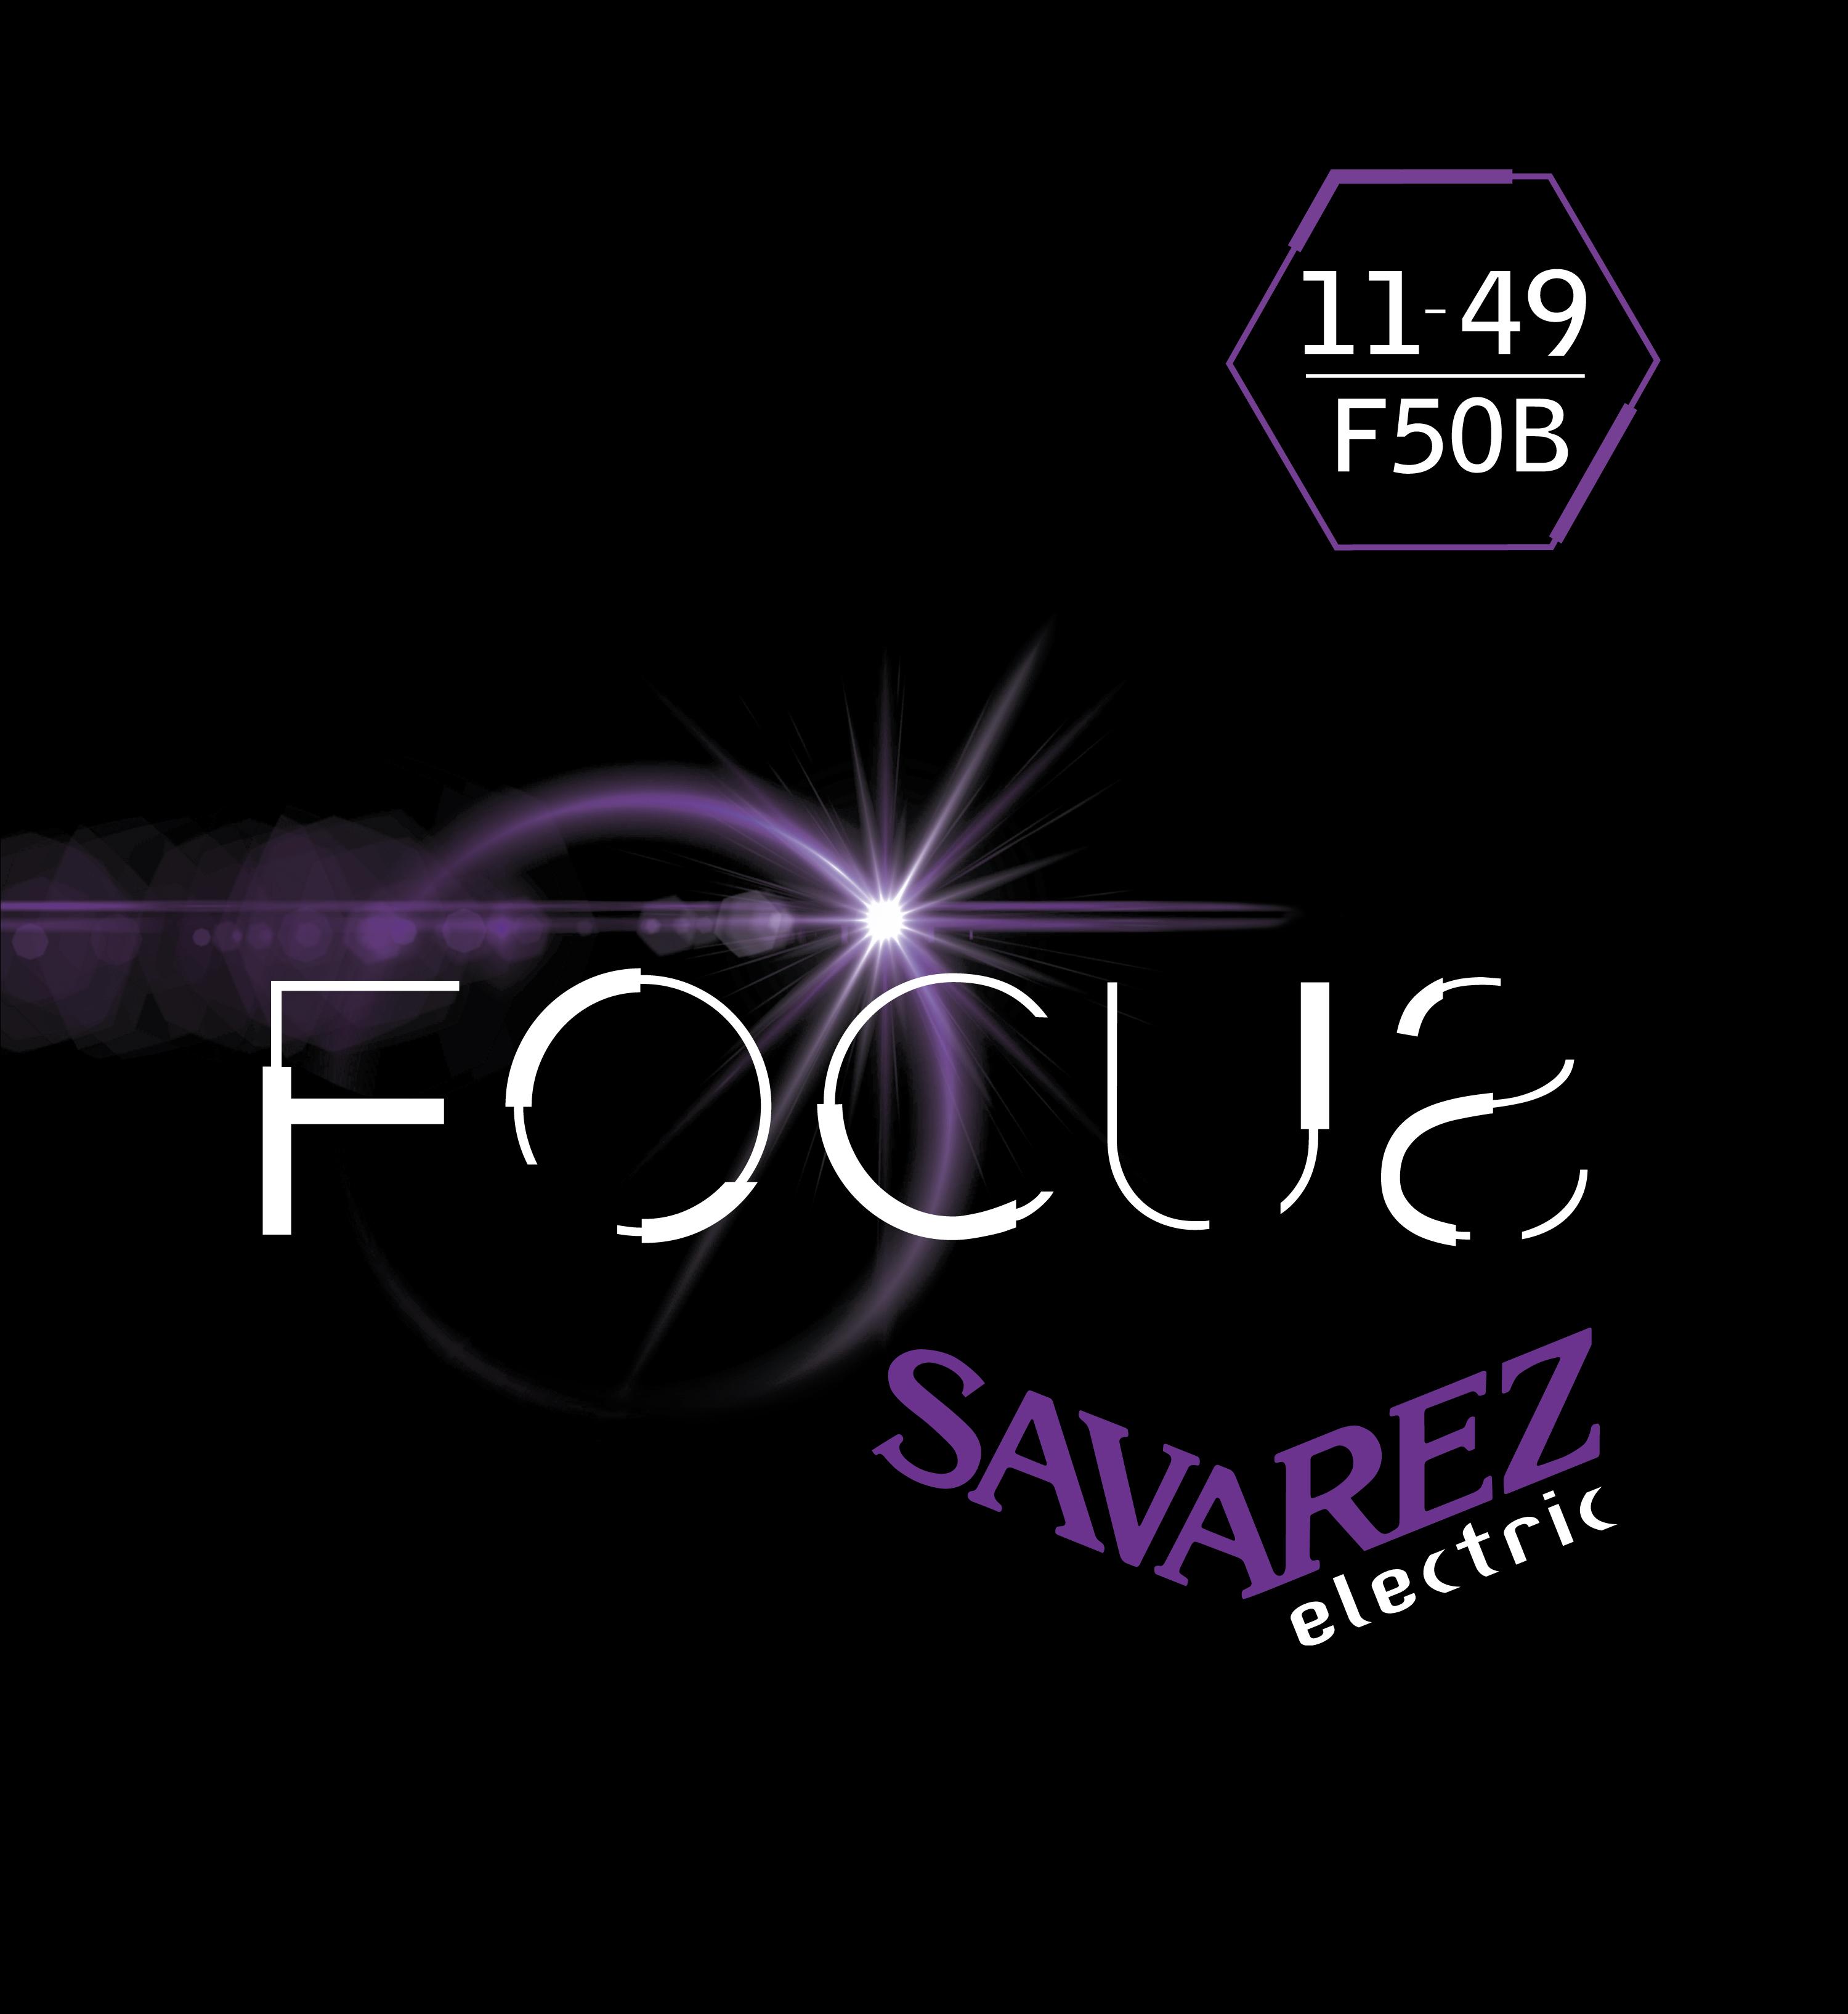 SAVAREZ ELECTRIC FOCUS F50B